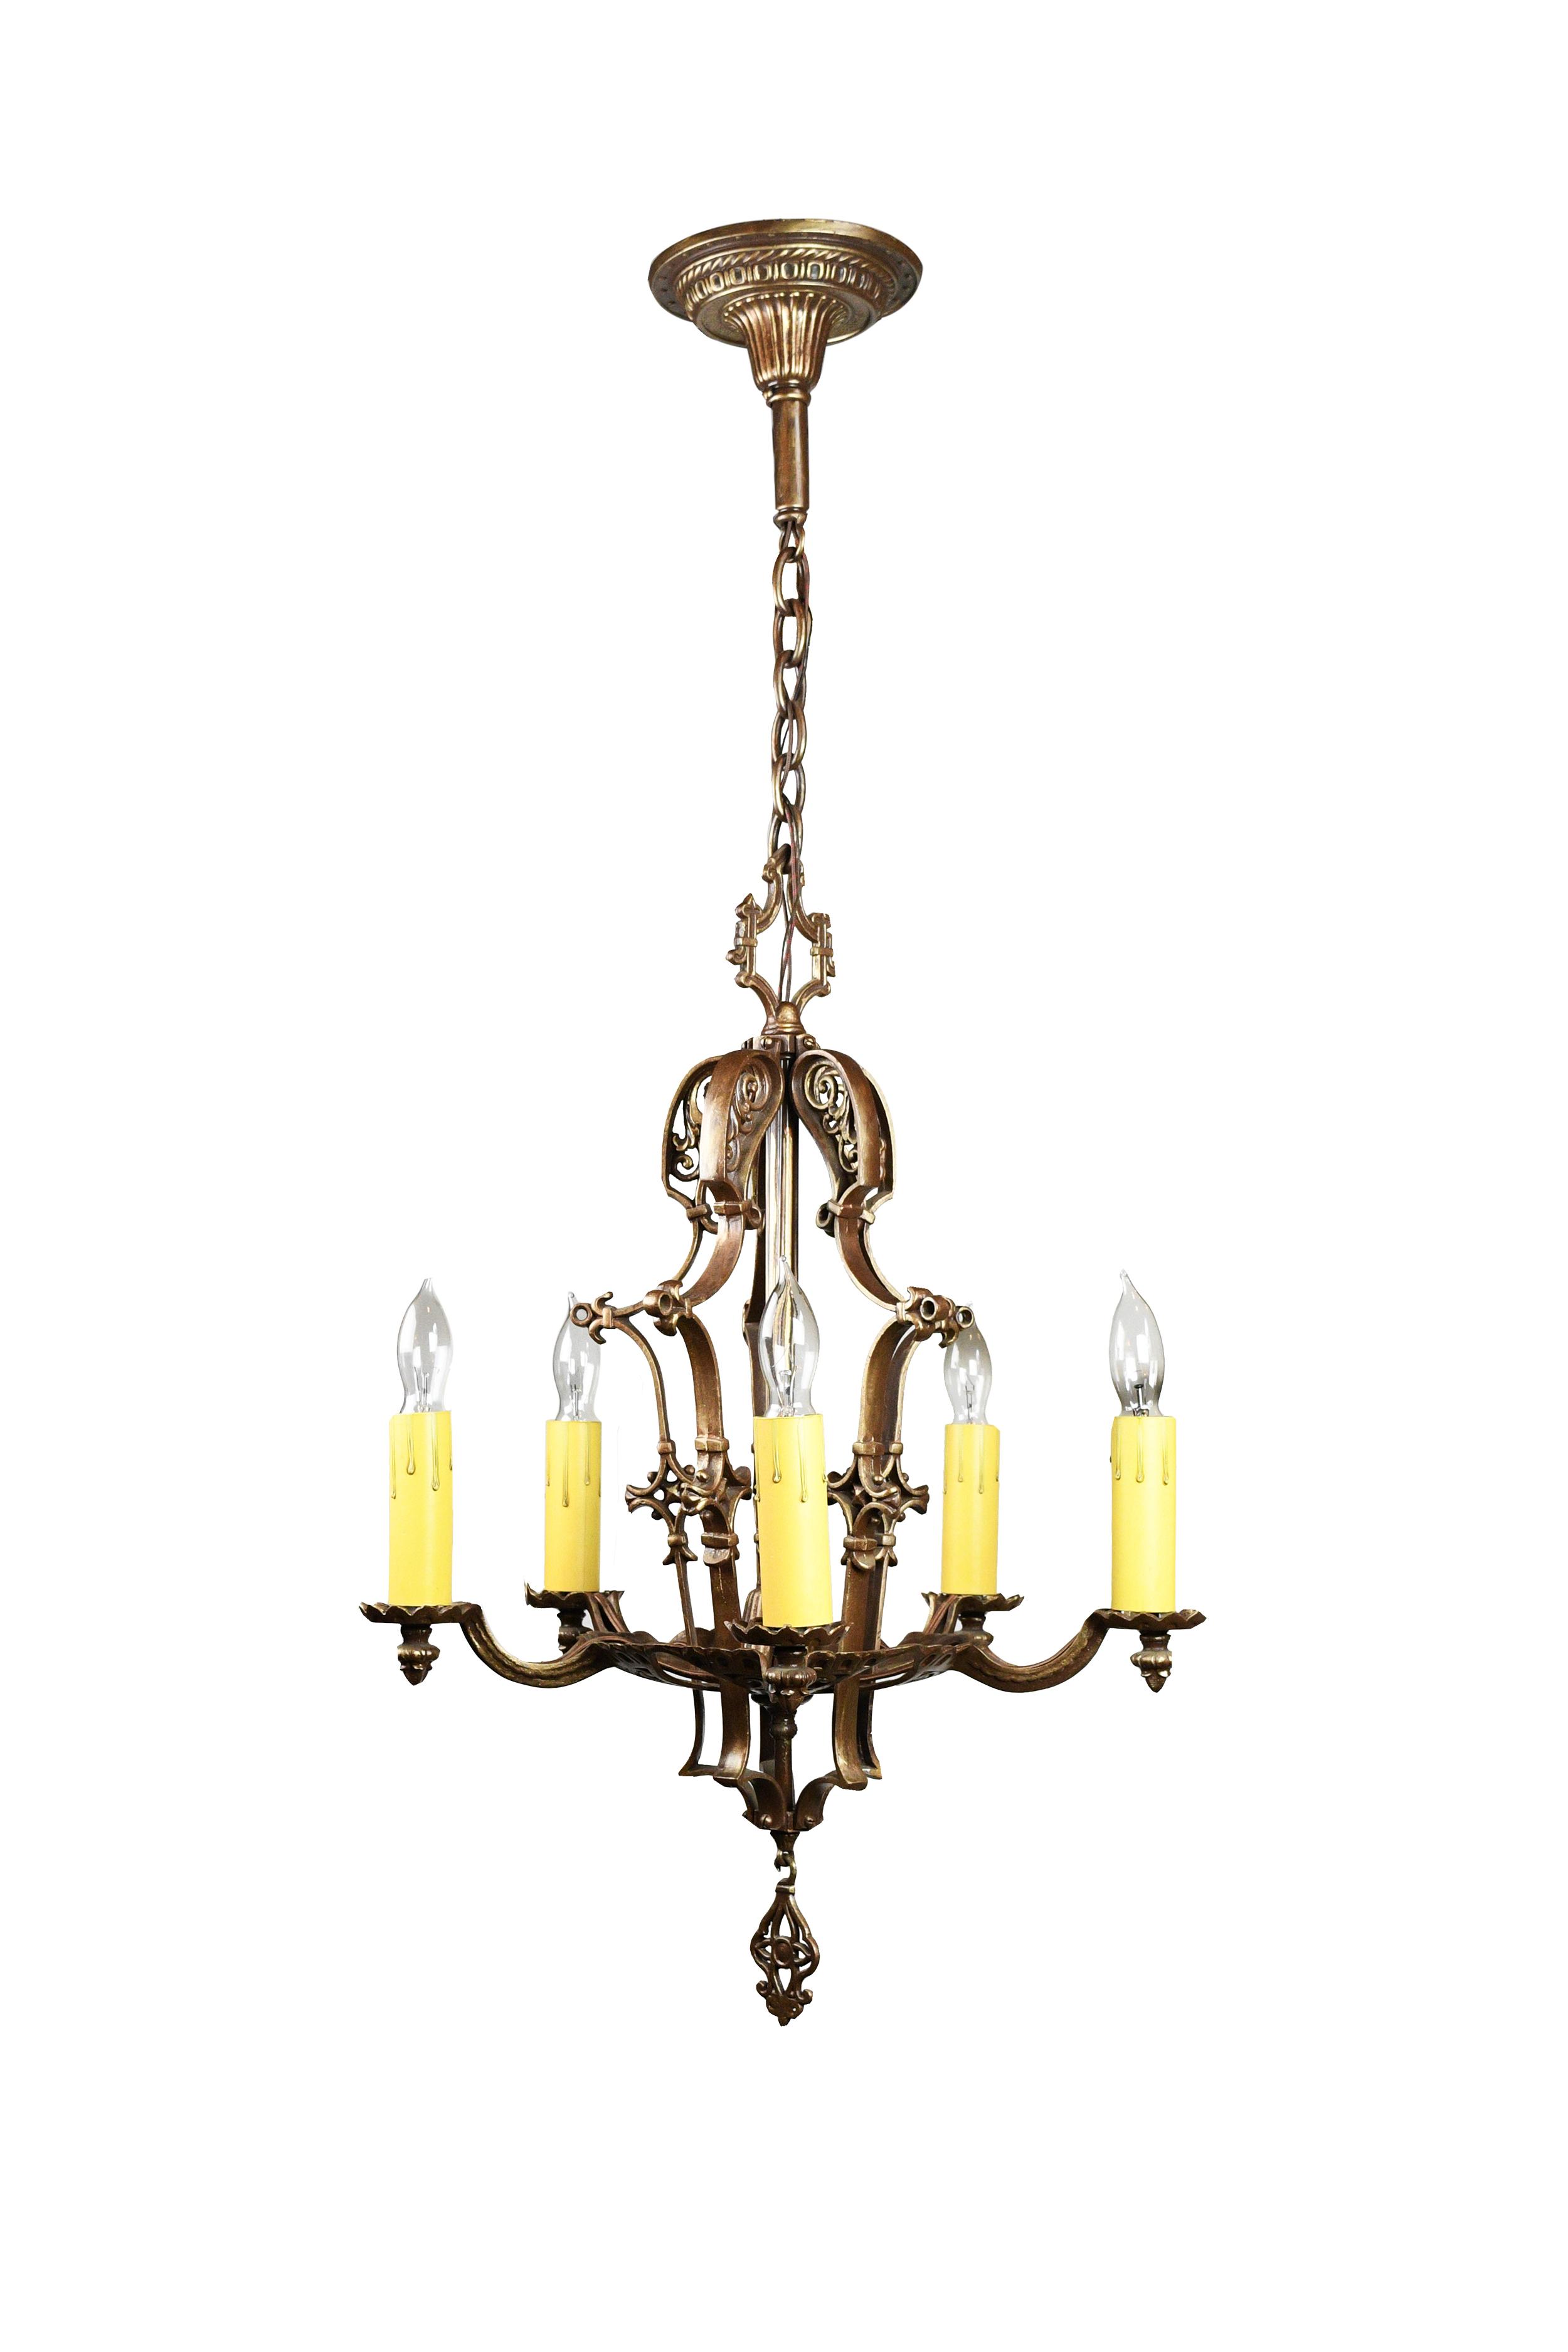 cast five light tudor chandelier